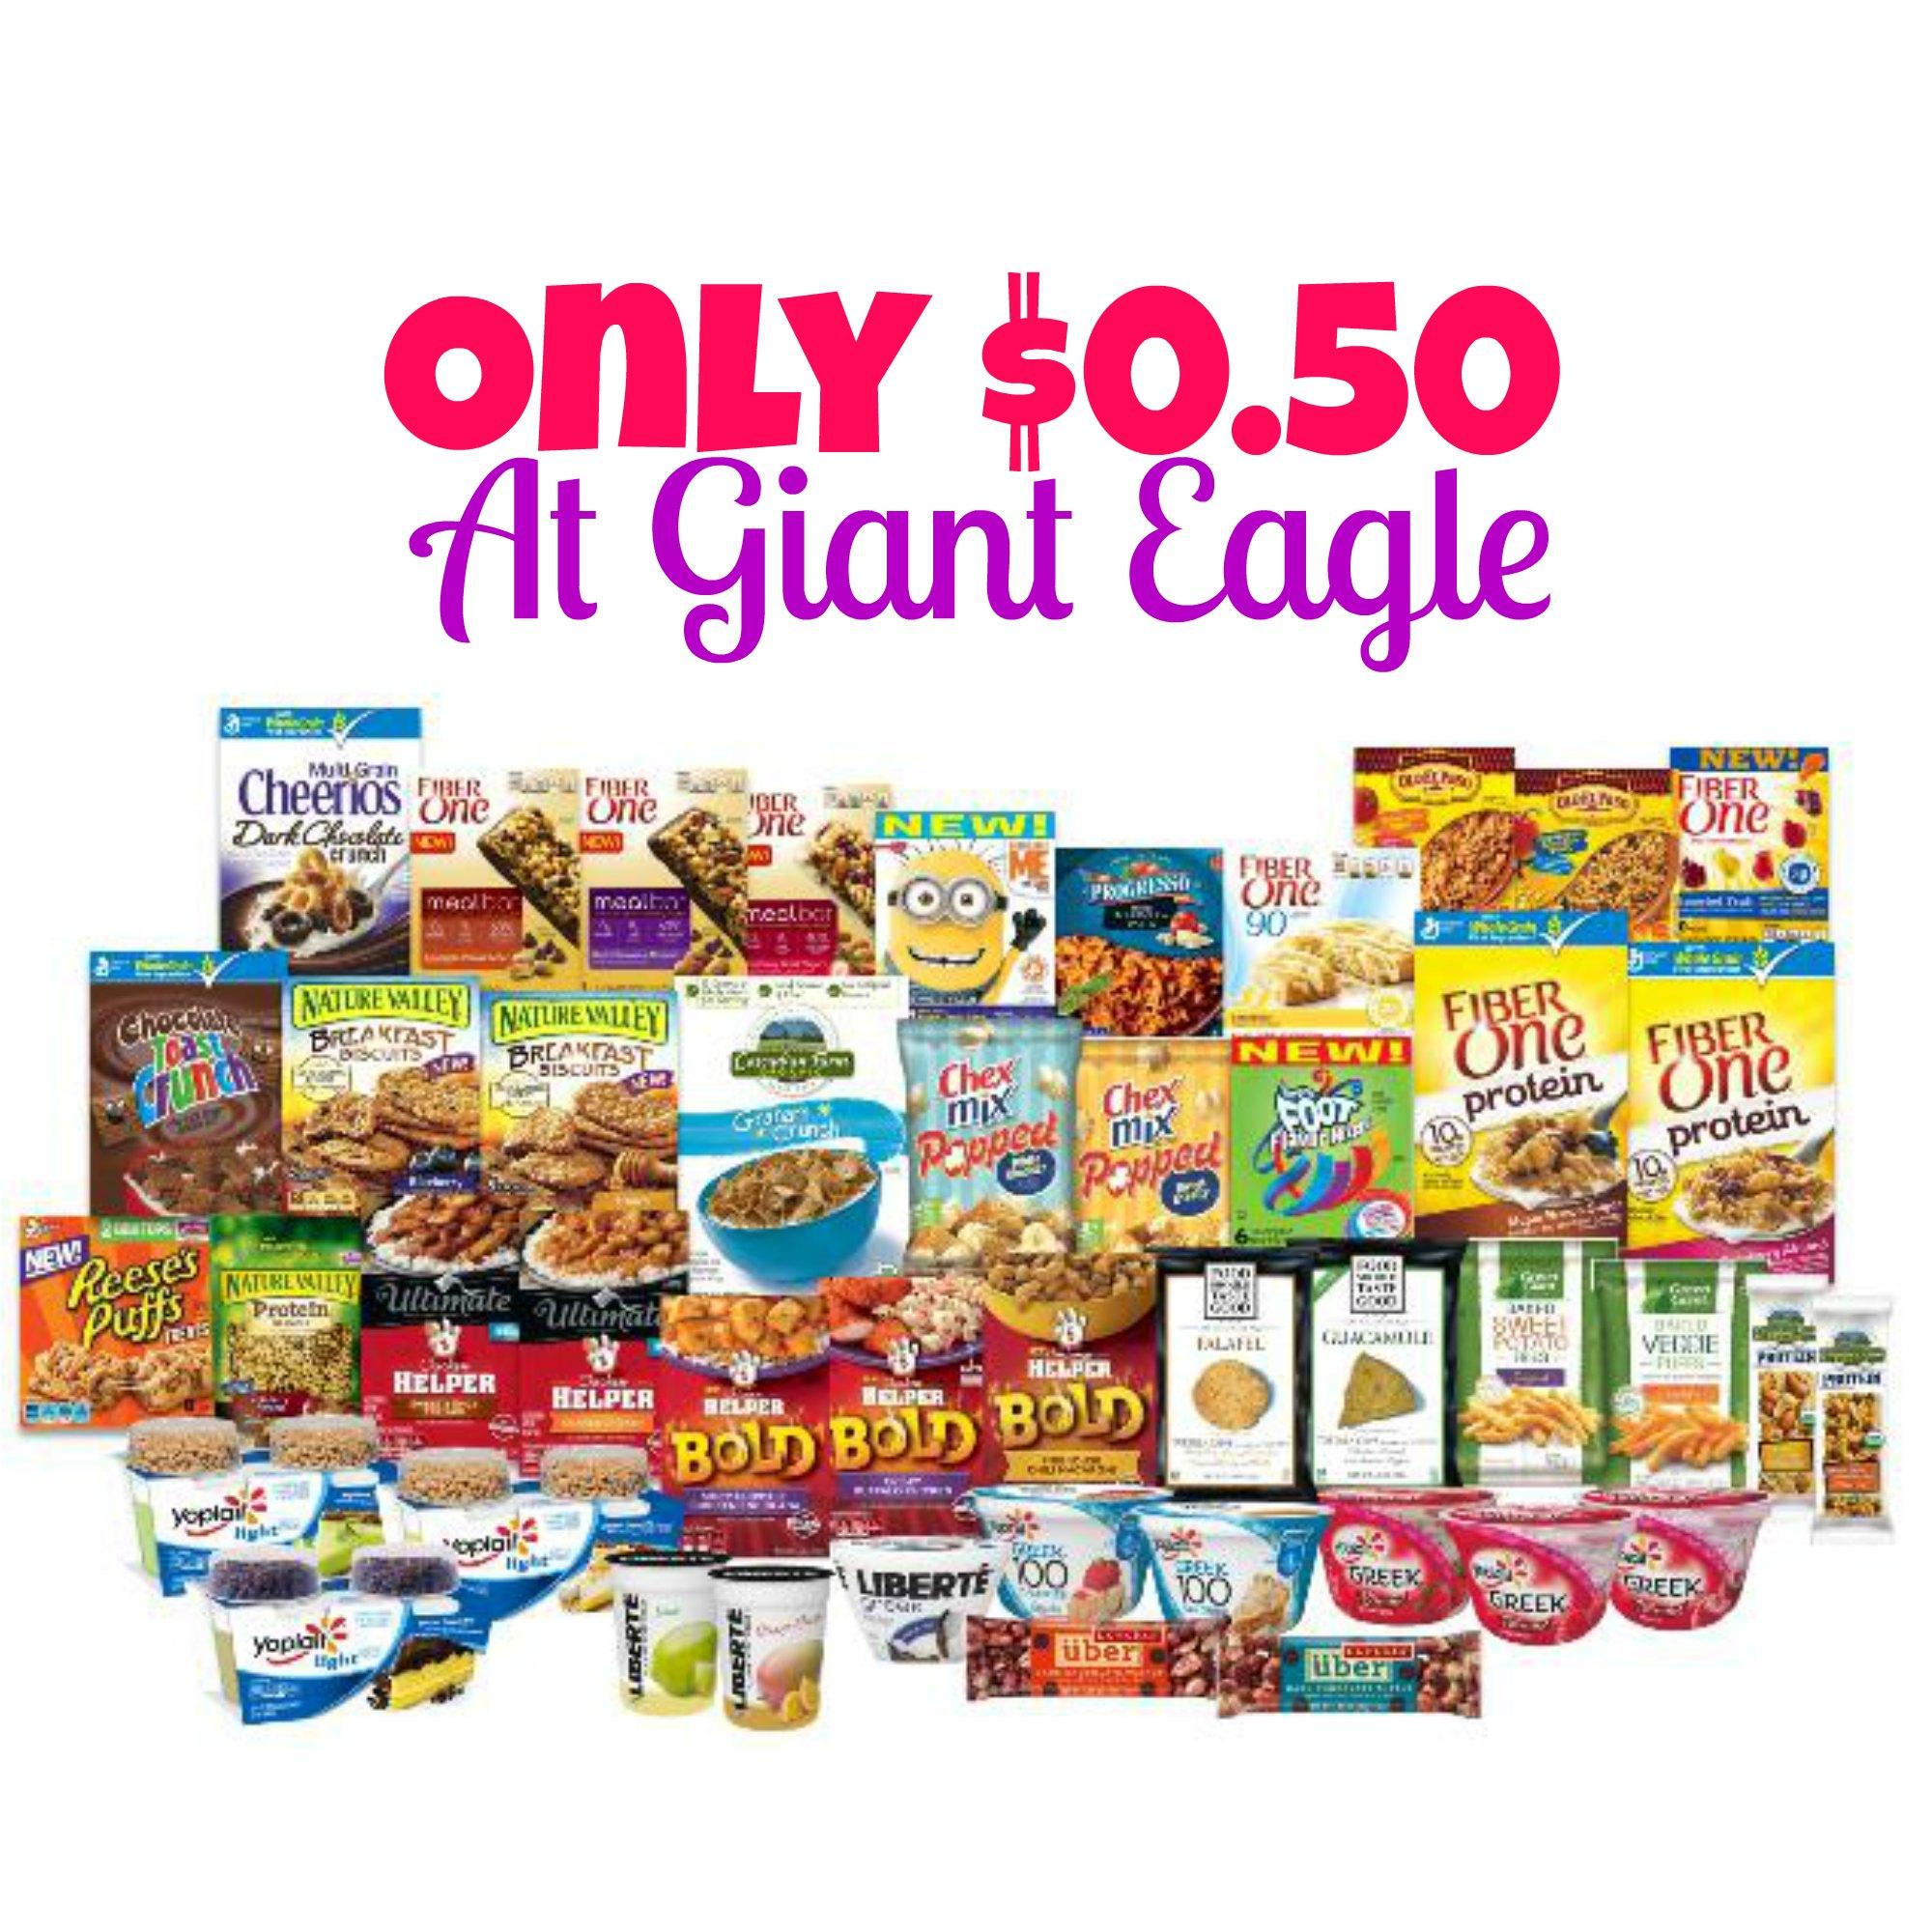 Giant Eagle | Mojosavings | Page 2 - Free Printable Giant Eagle Coupons